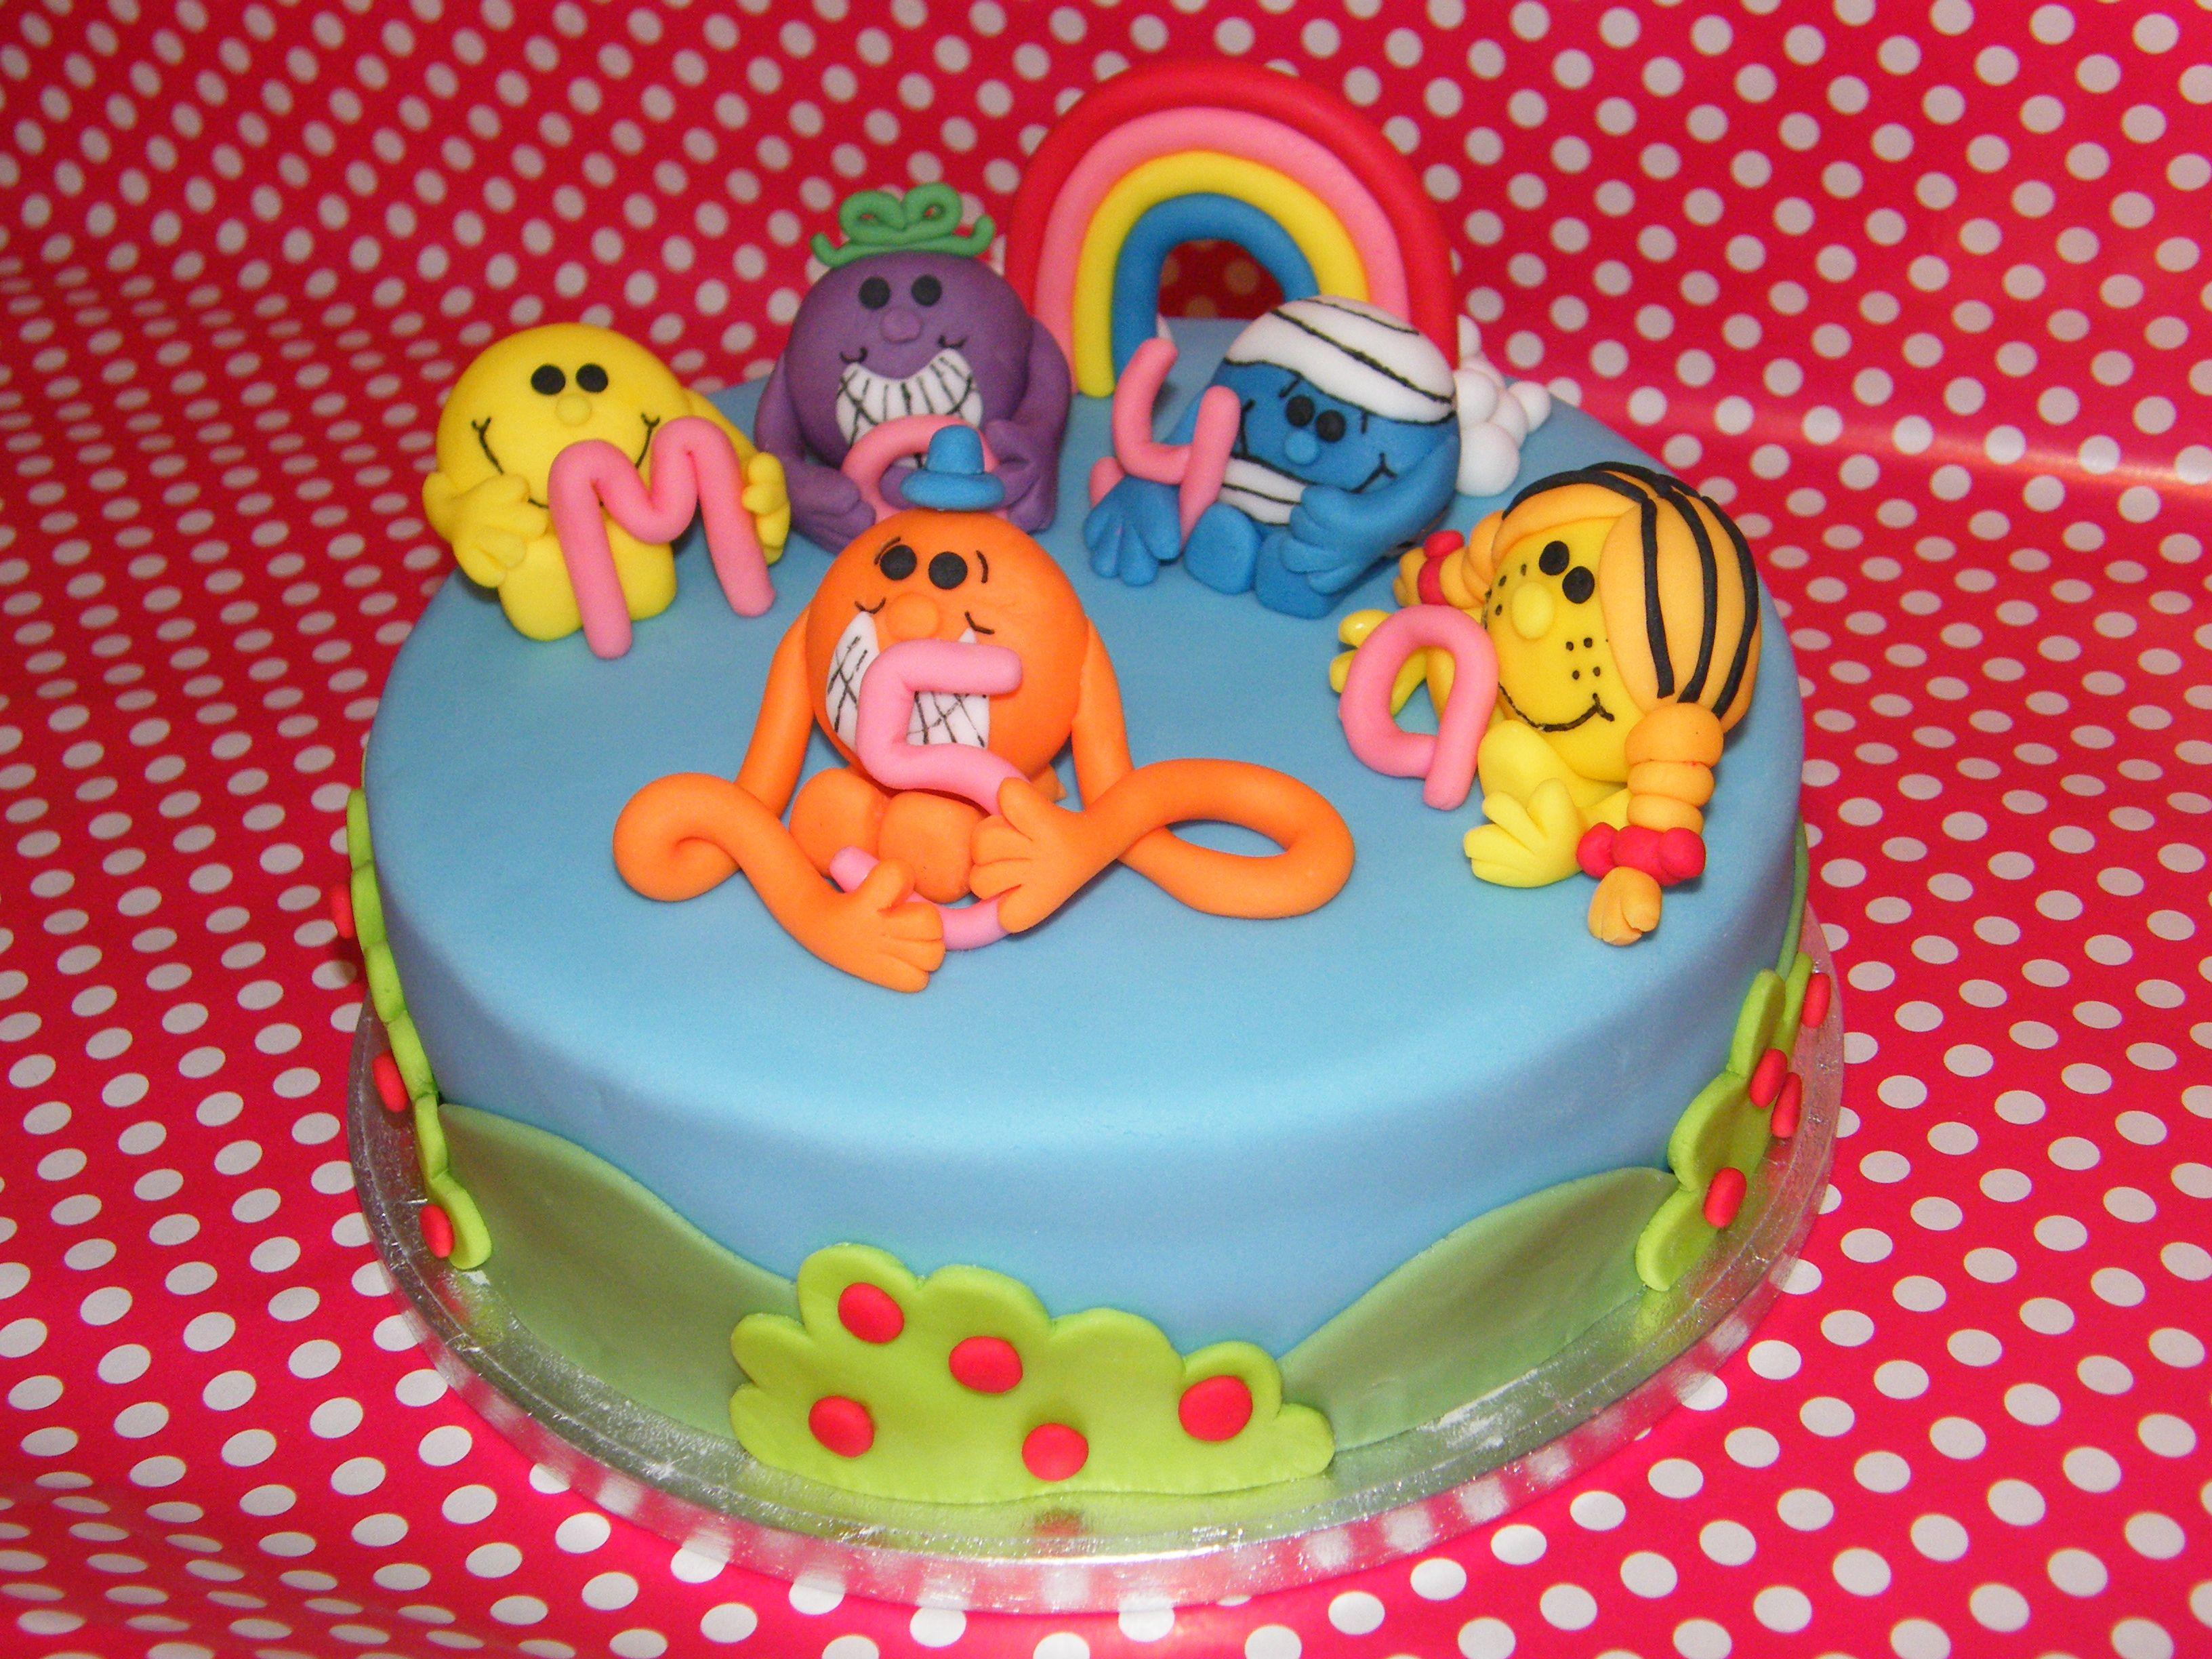 Mr Men And Little Miss Cake Joshi Nd Party Ideas Pinterest - Little miss birthday cake